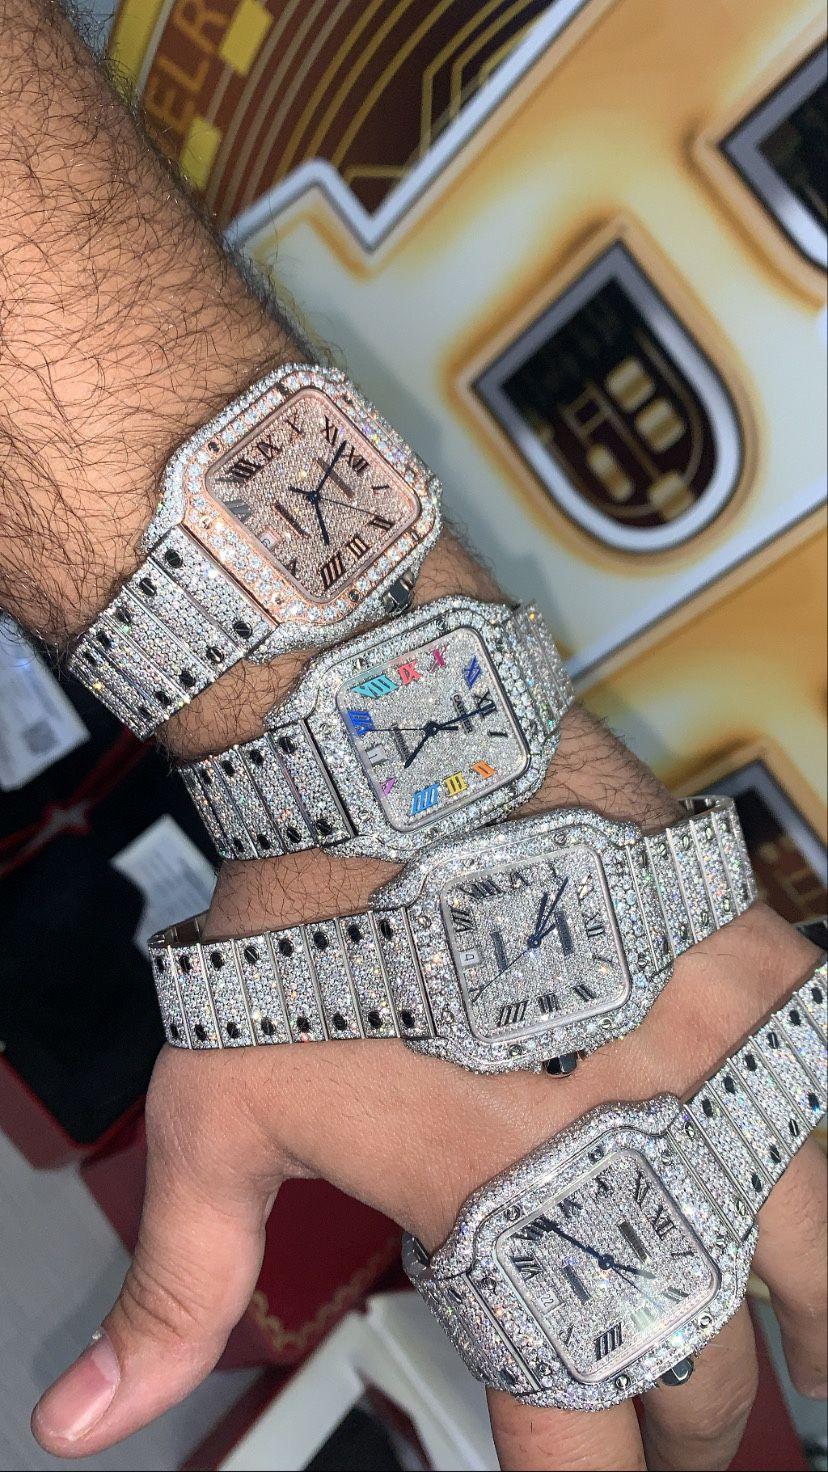 Cartier Santos XL Bustdown ❄️all Over 17.35CT Diamonds 2020